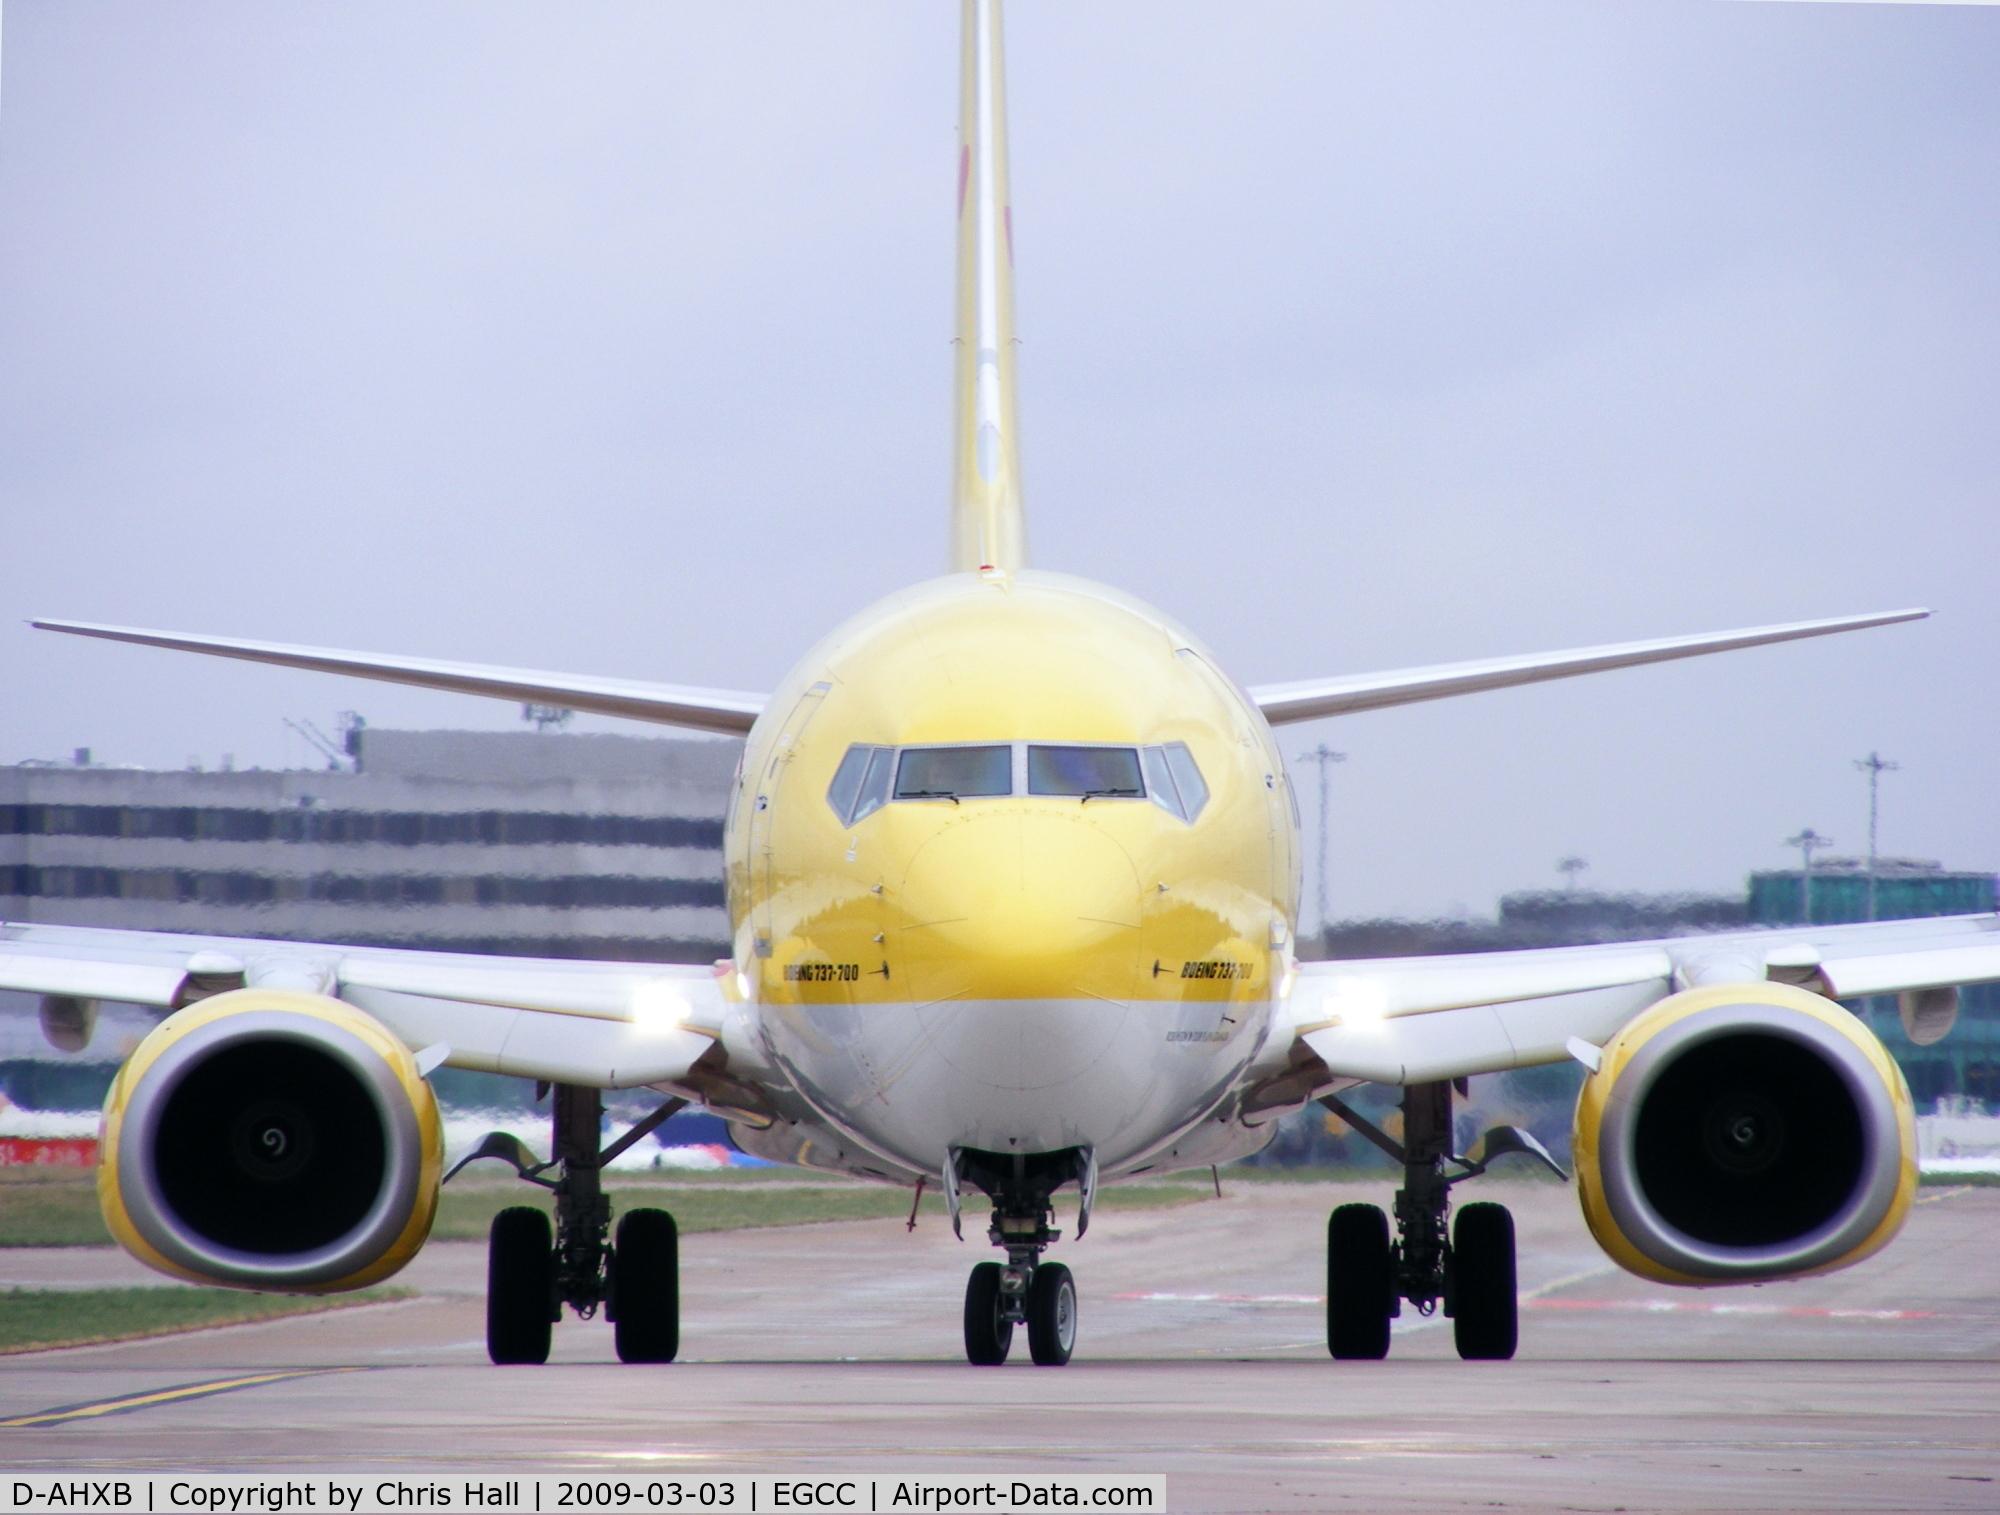 D-AHXB, 2007 Boeing 737-7K5 C/N 30717/2228, TUI